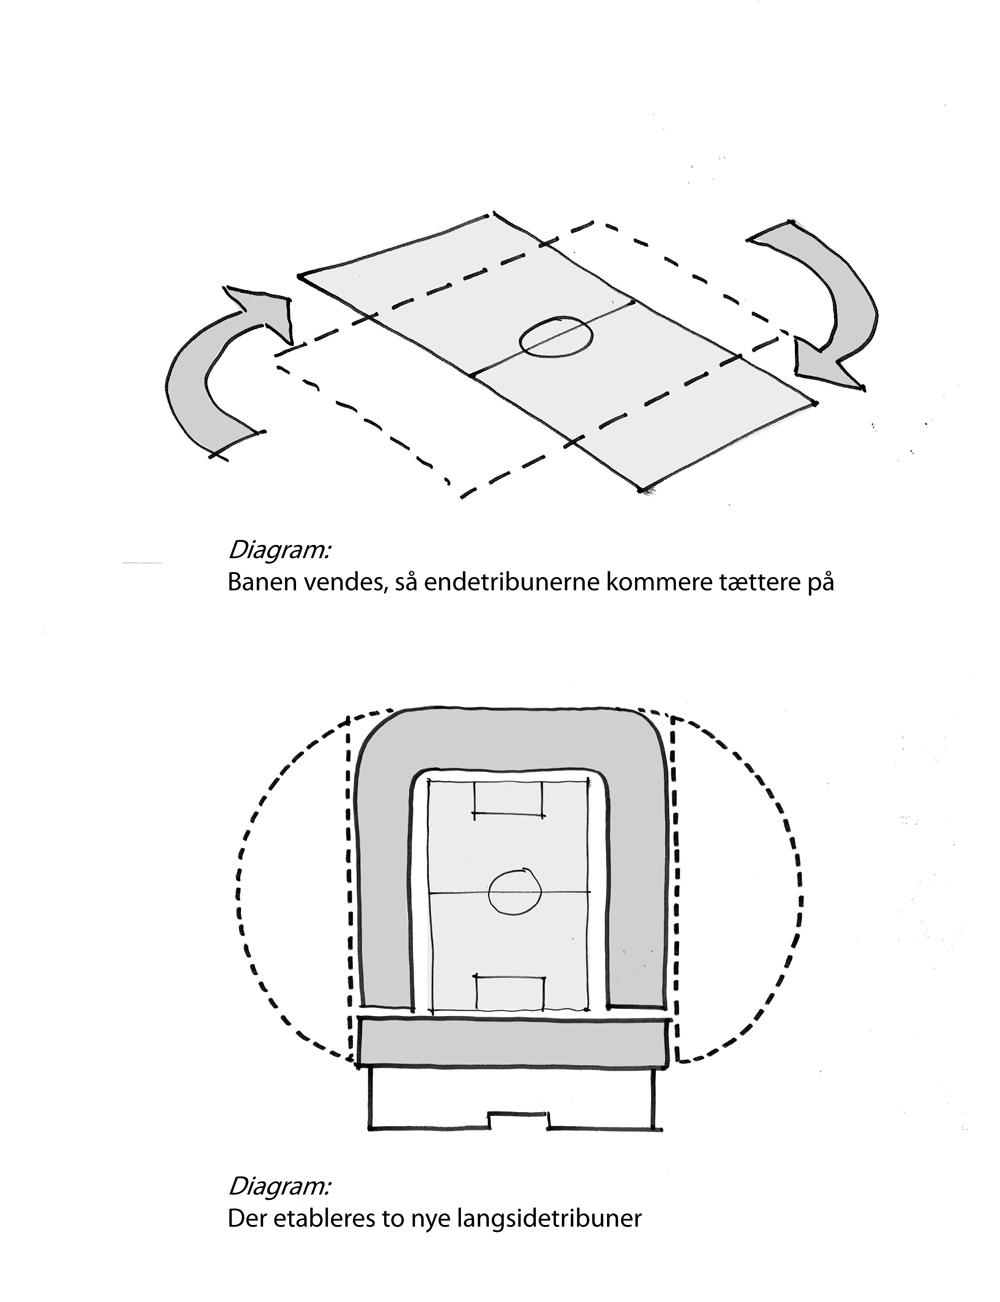 2_Diagrammer